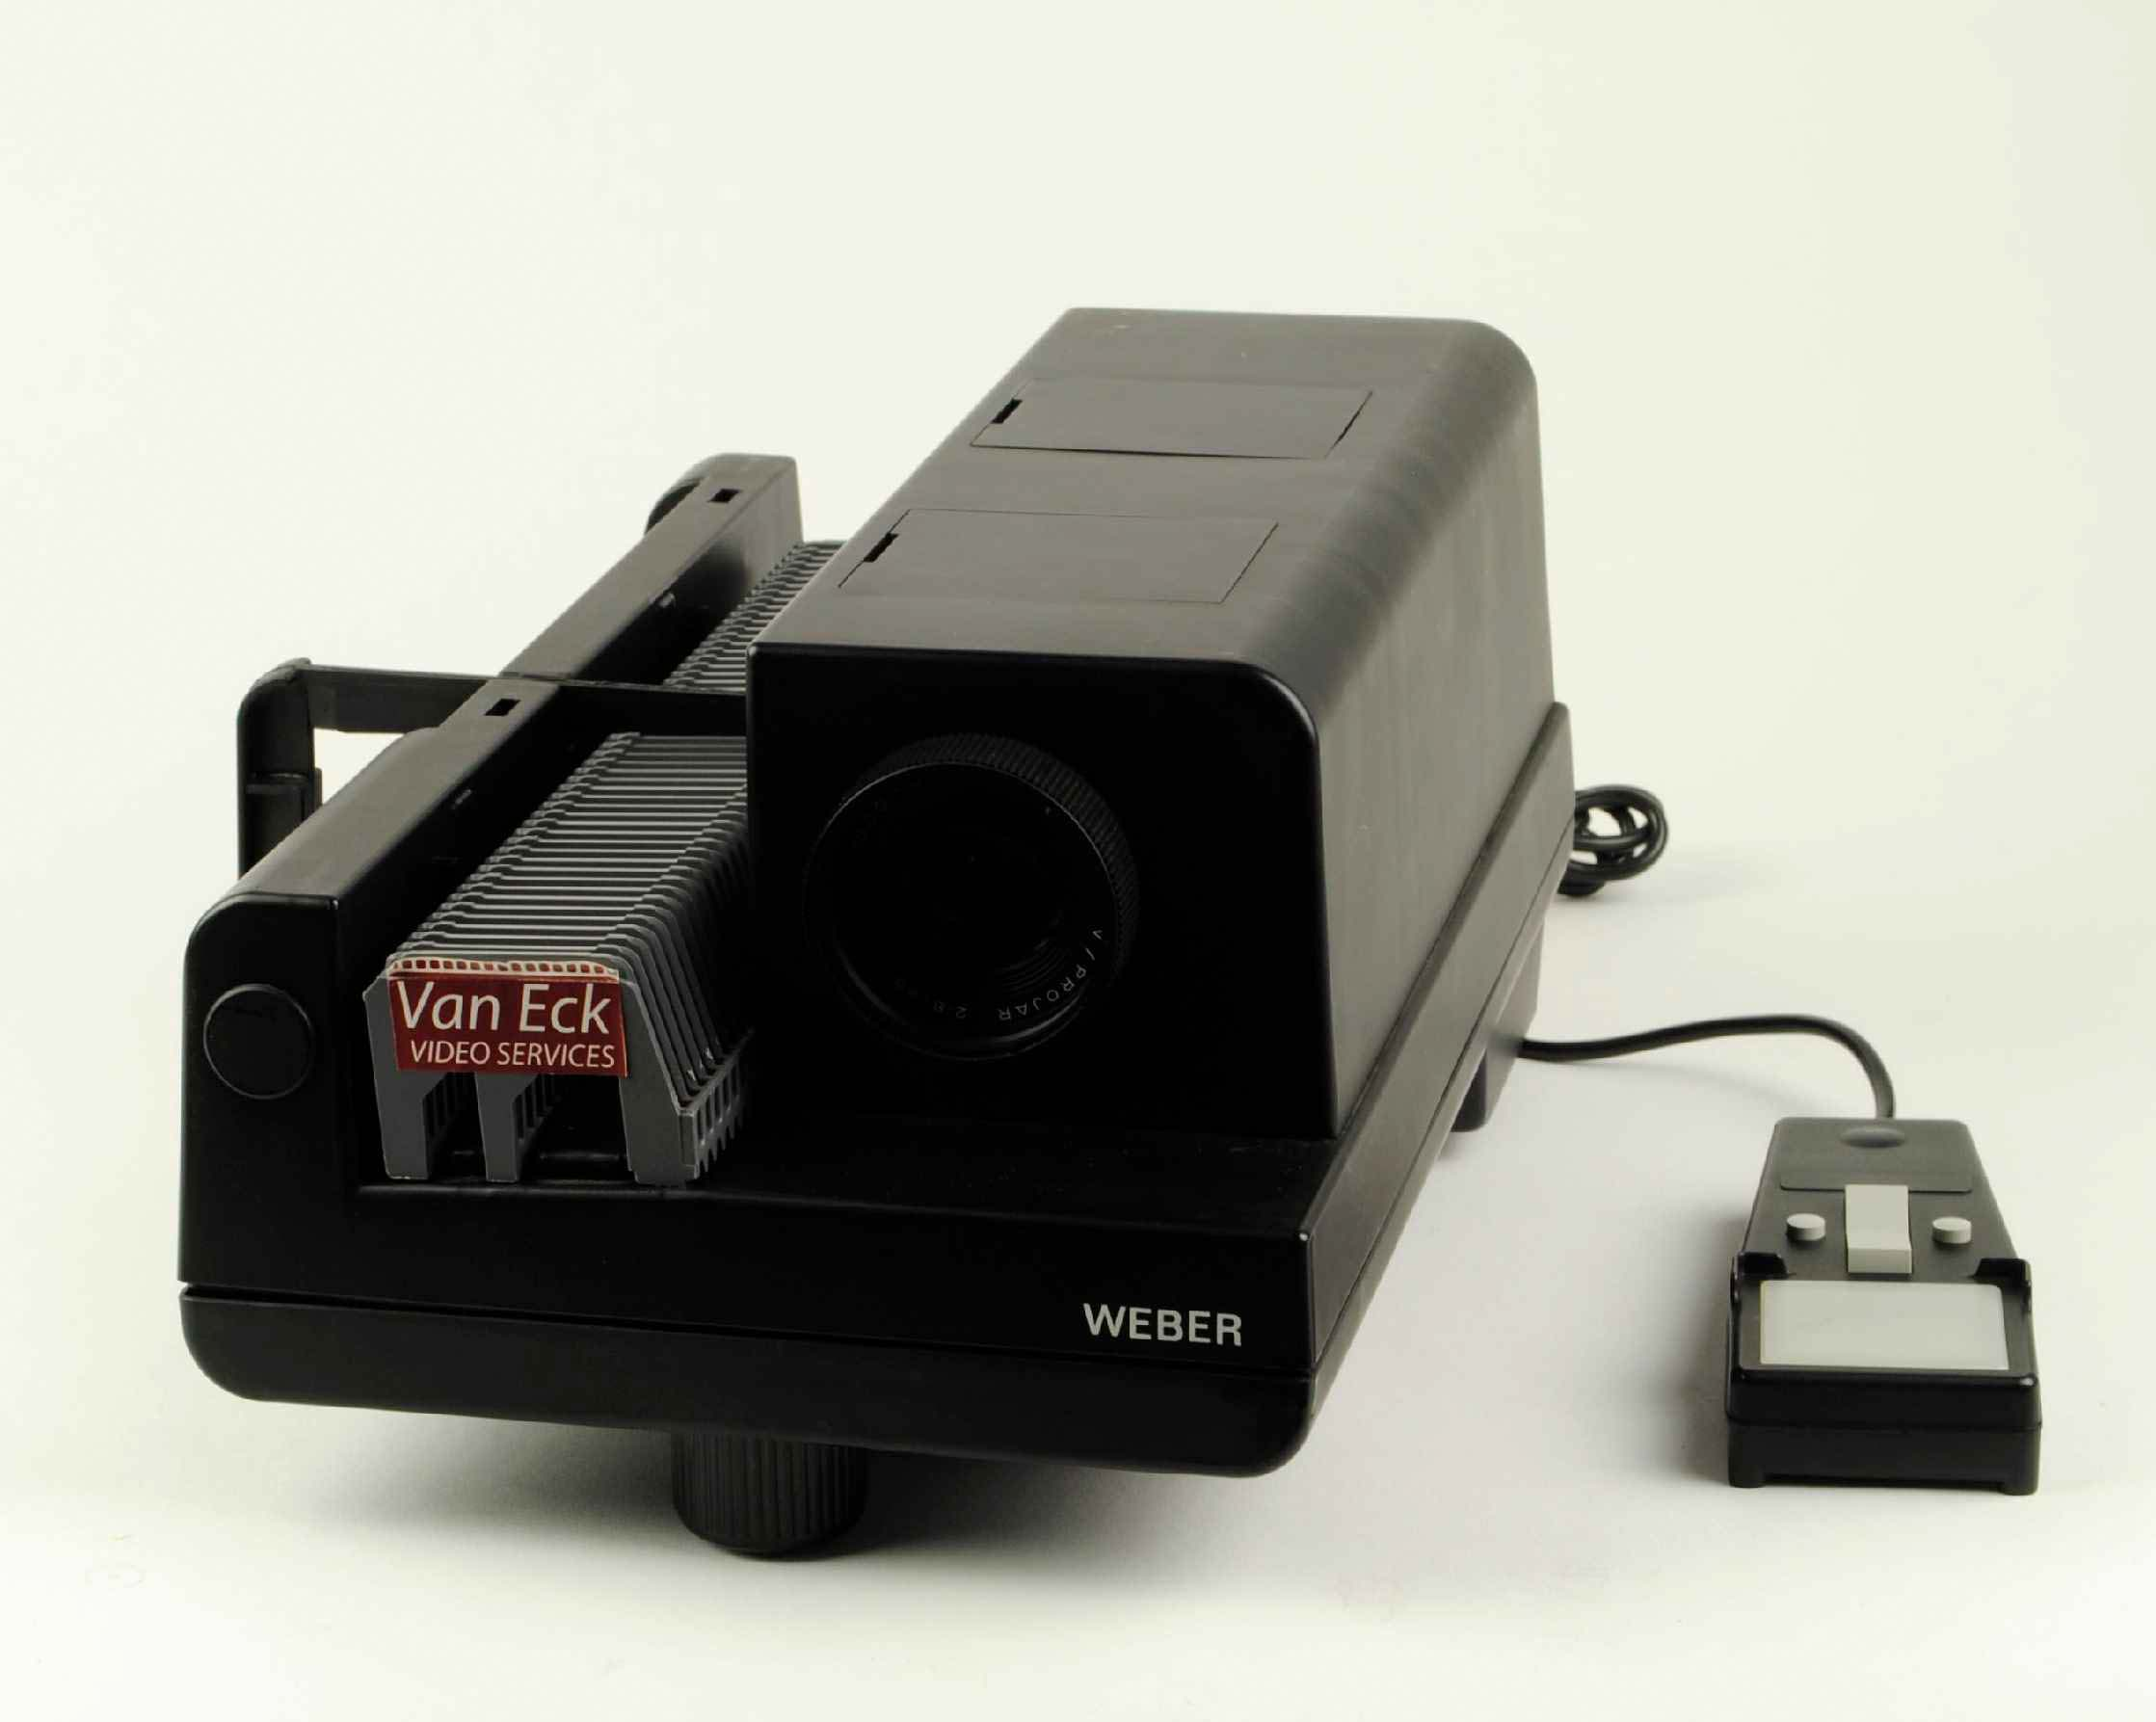 Weber dia vollautomat 4005 electronic diaprojectoren for Lampen gottingen